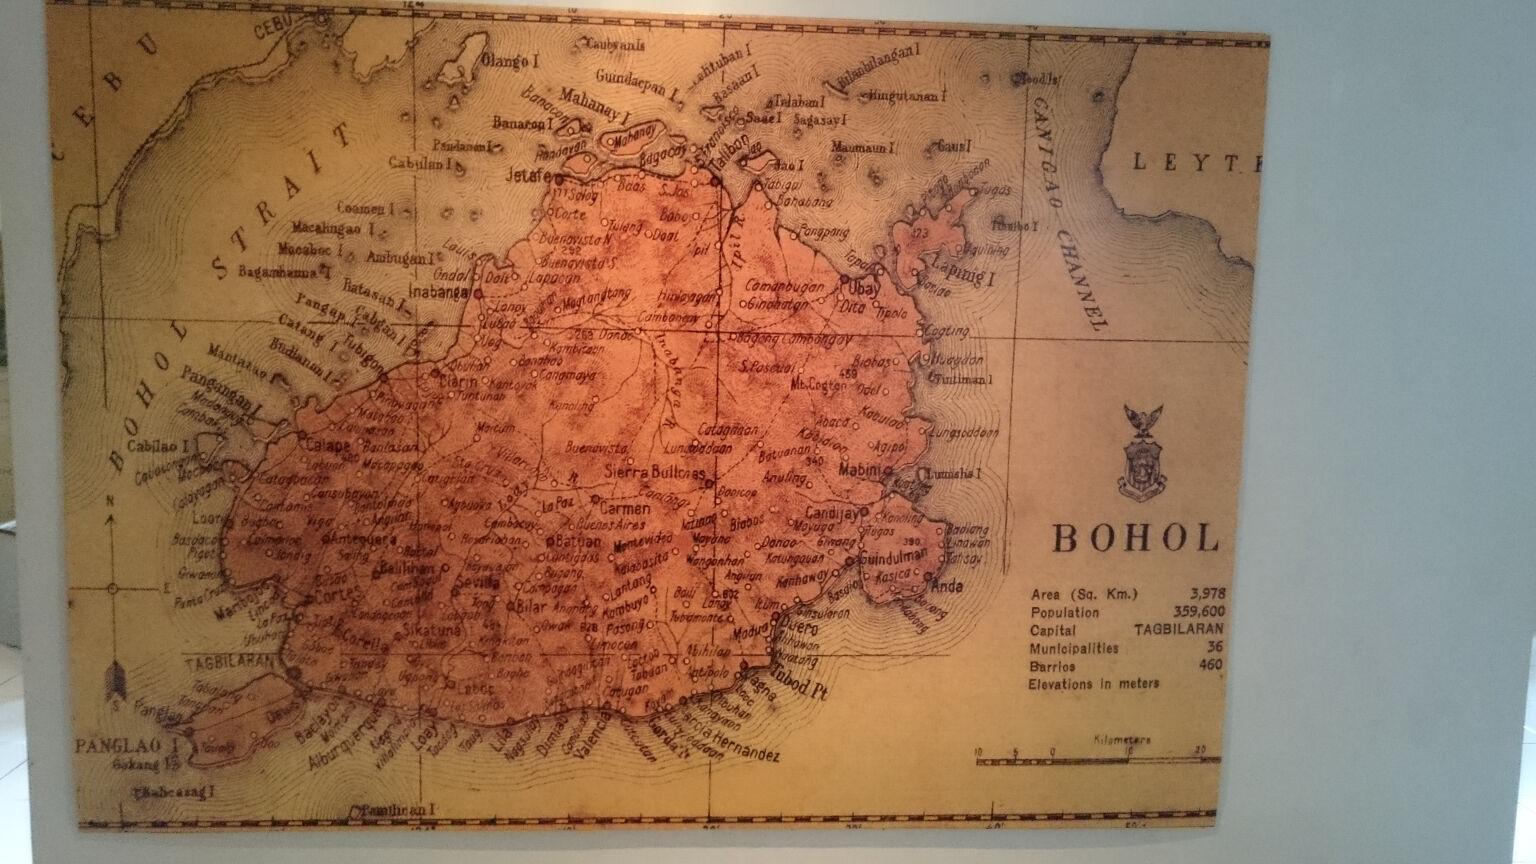 tagbilaran-bohol-national-museum-map-of-bohol